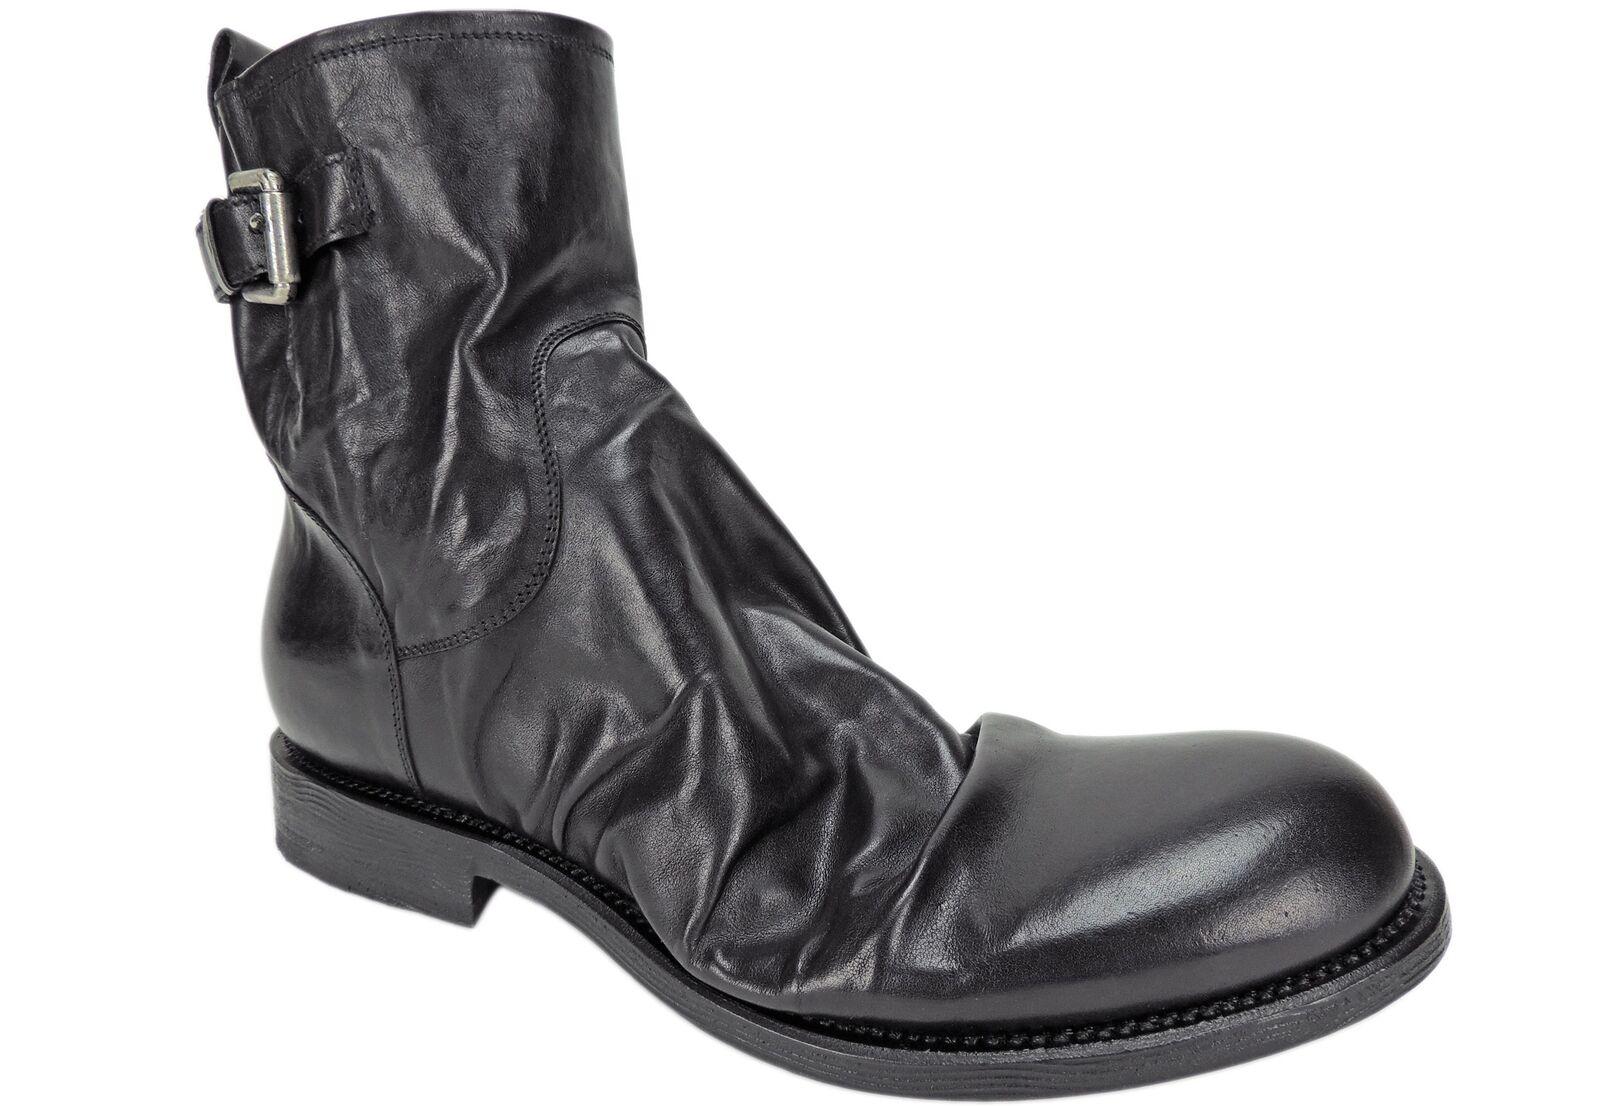 Raparo Men's Canguro black Washed Buckle Boots Black Wrinkled Leather Size 9.5 M